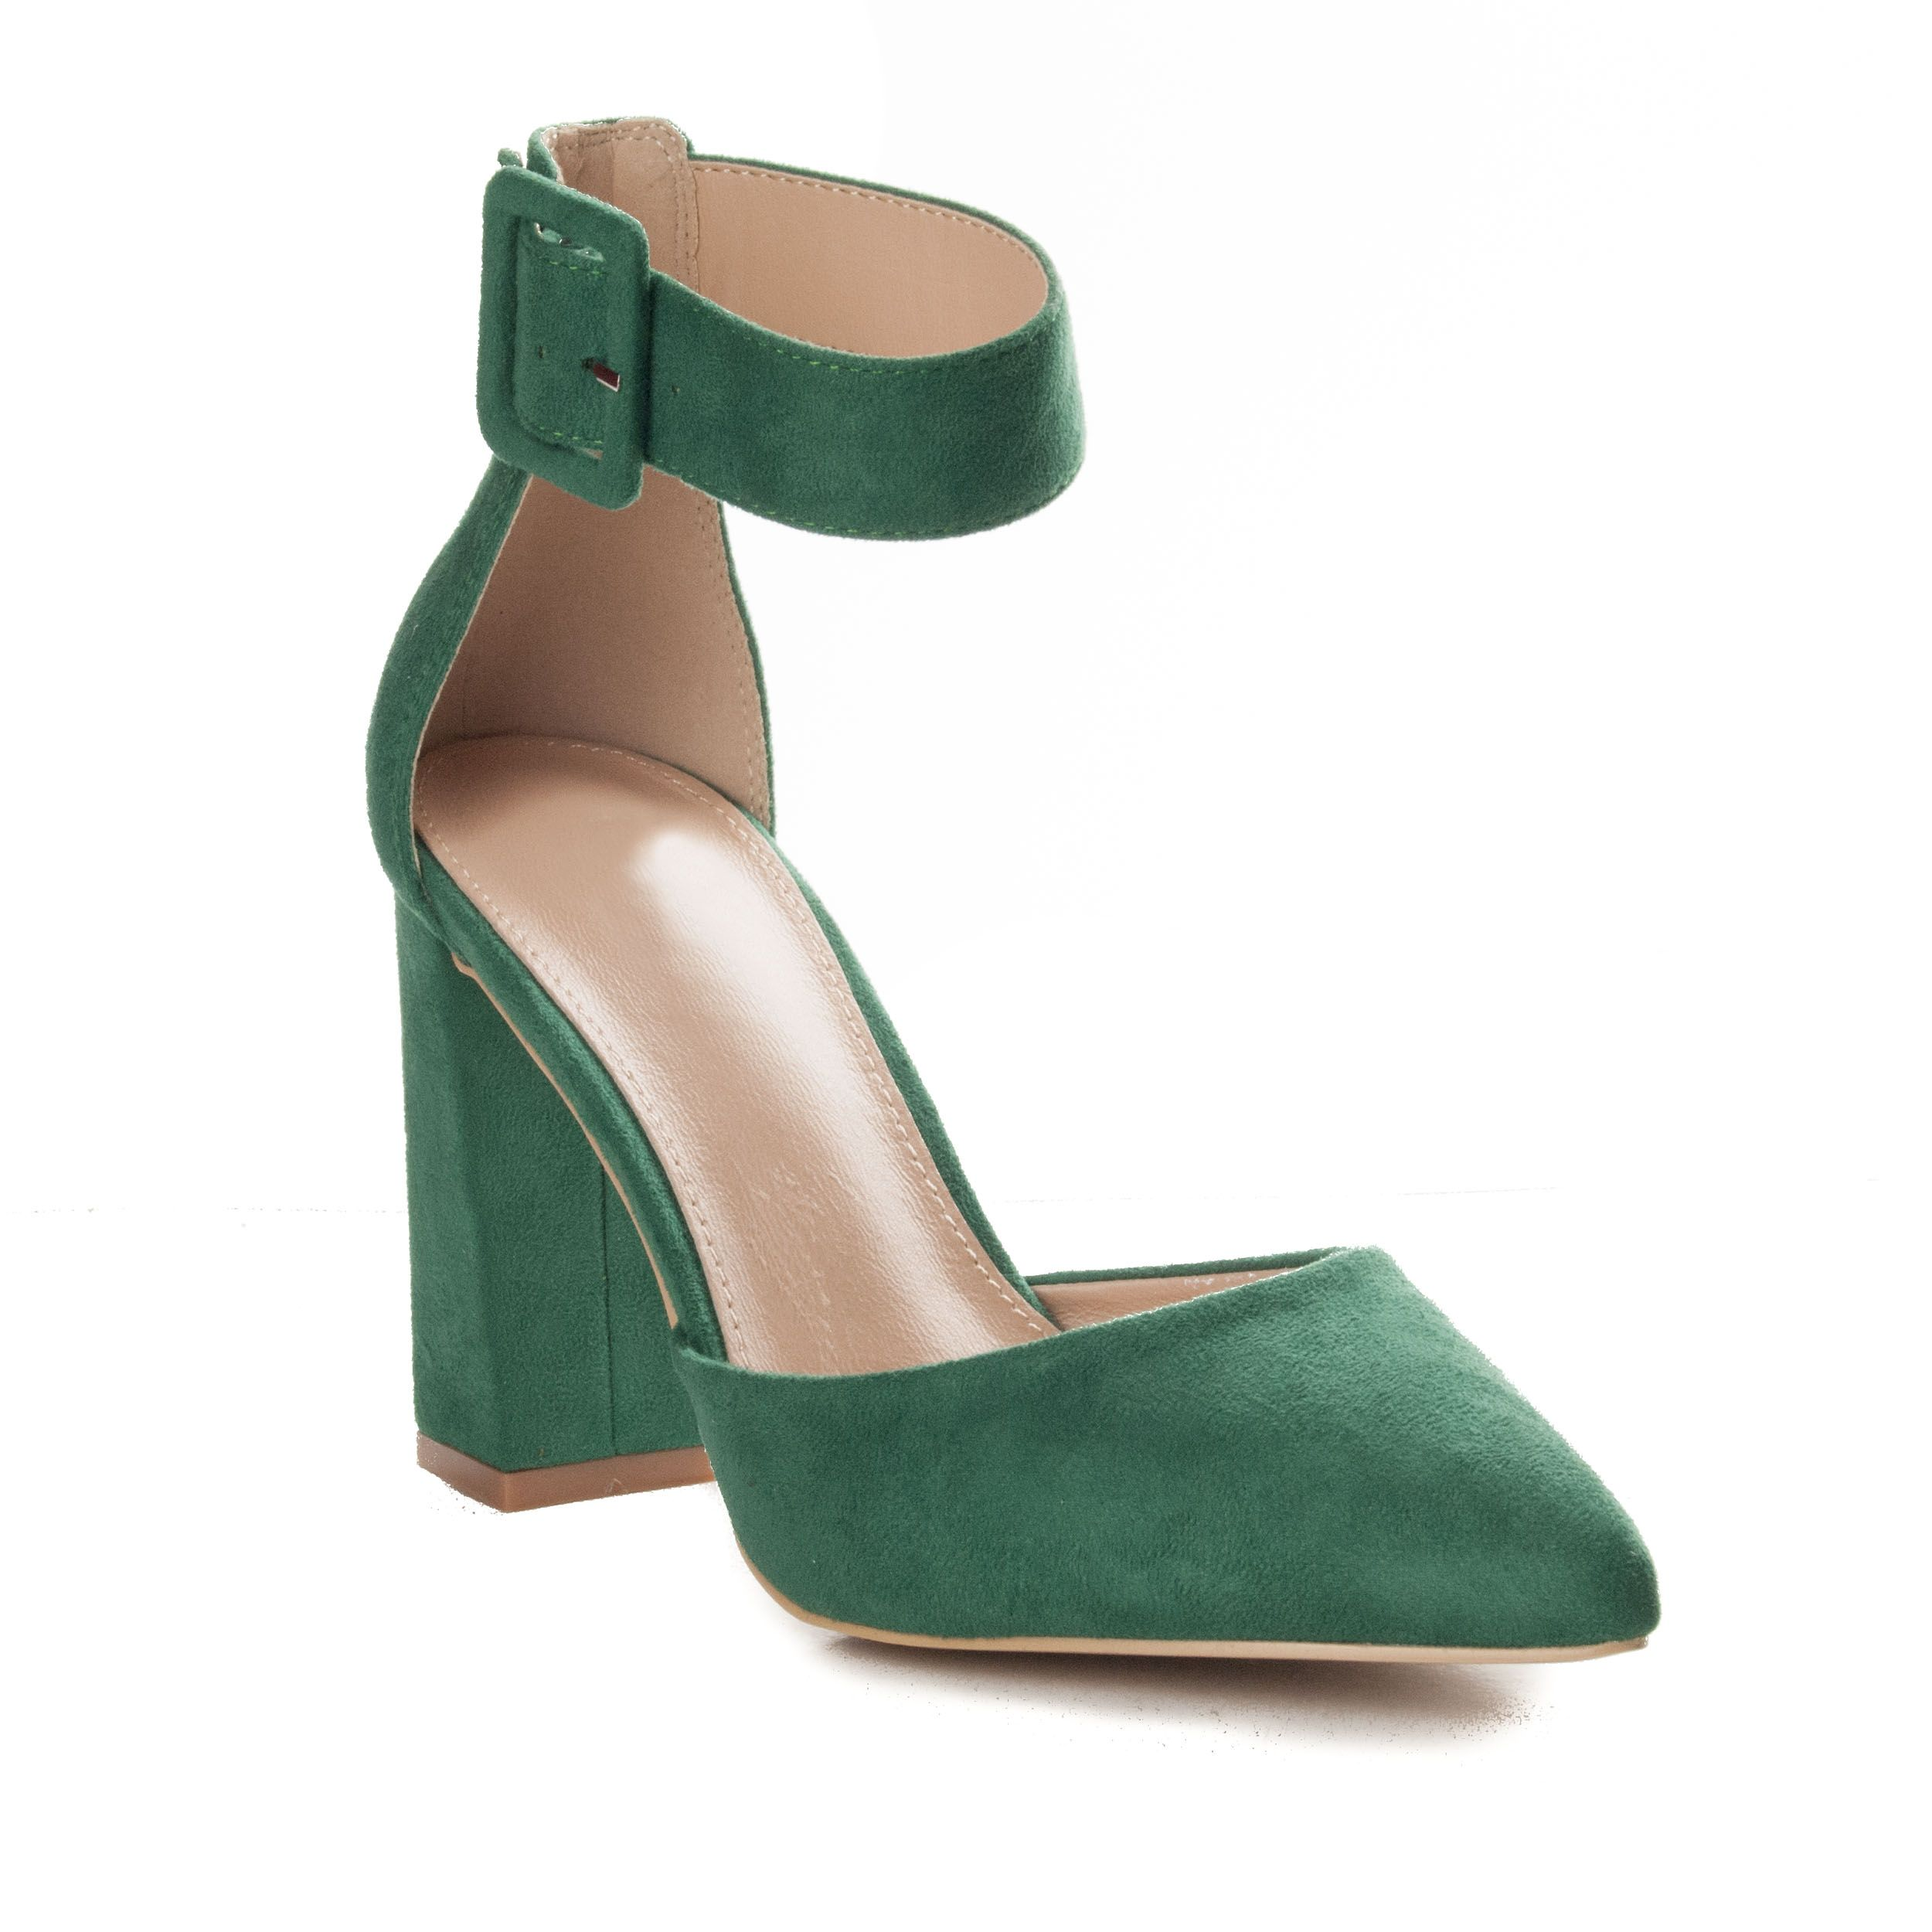 Montevita Block Heel Sandal in Green